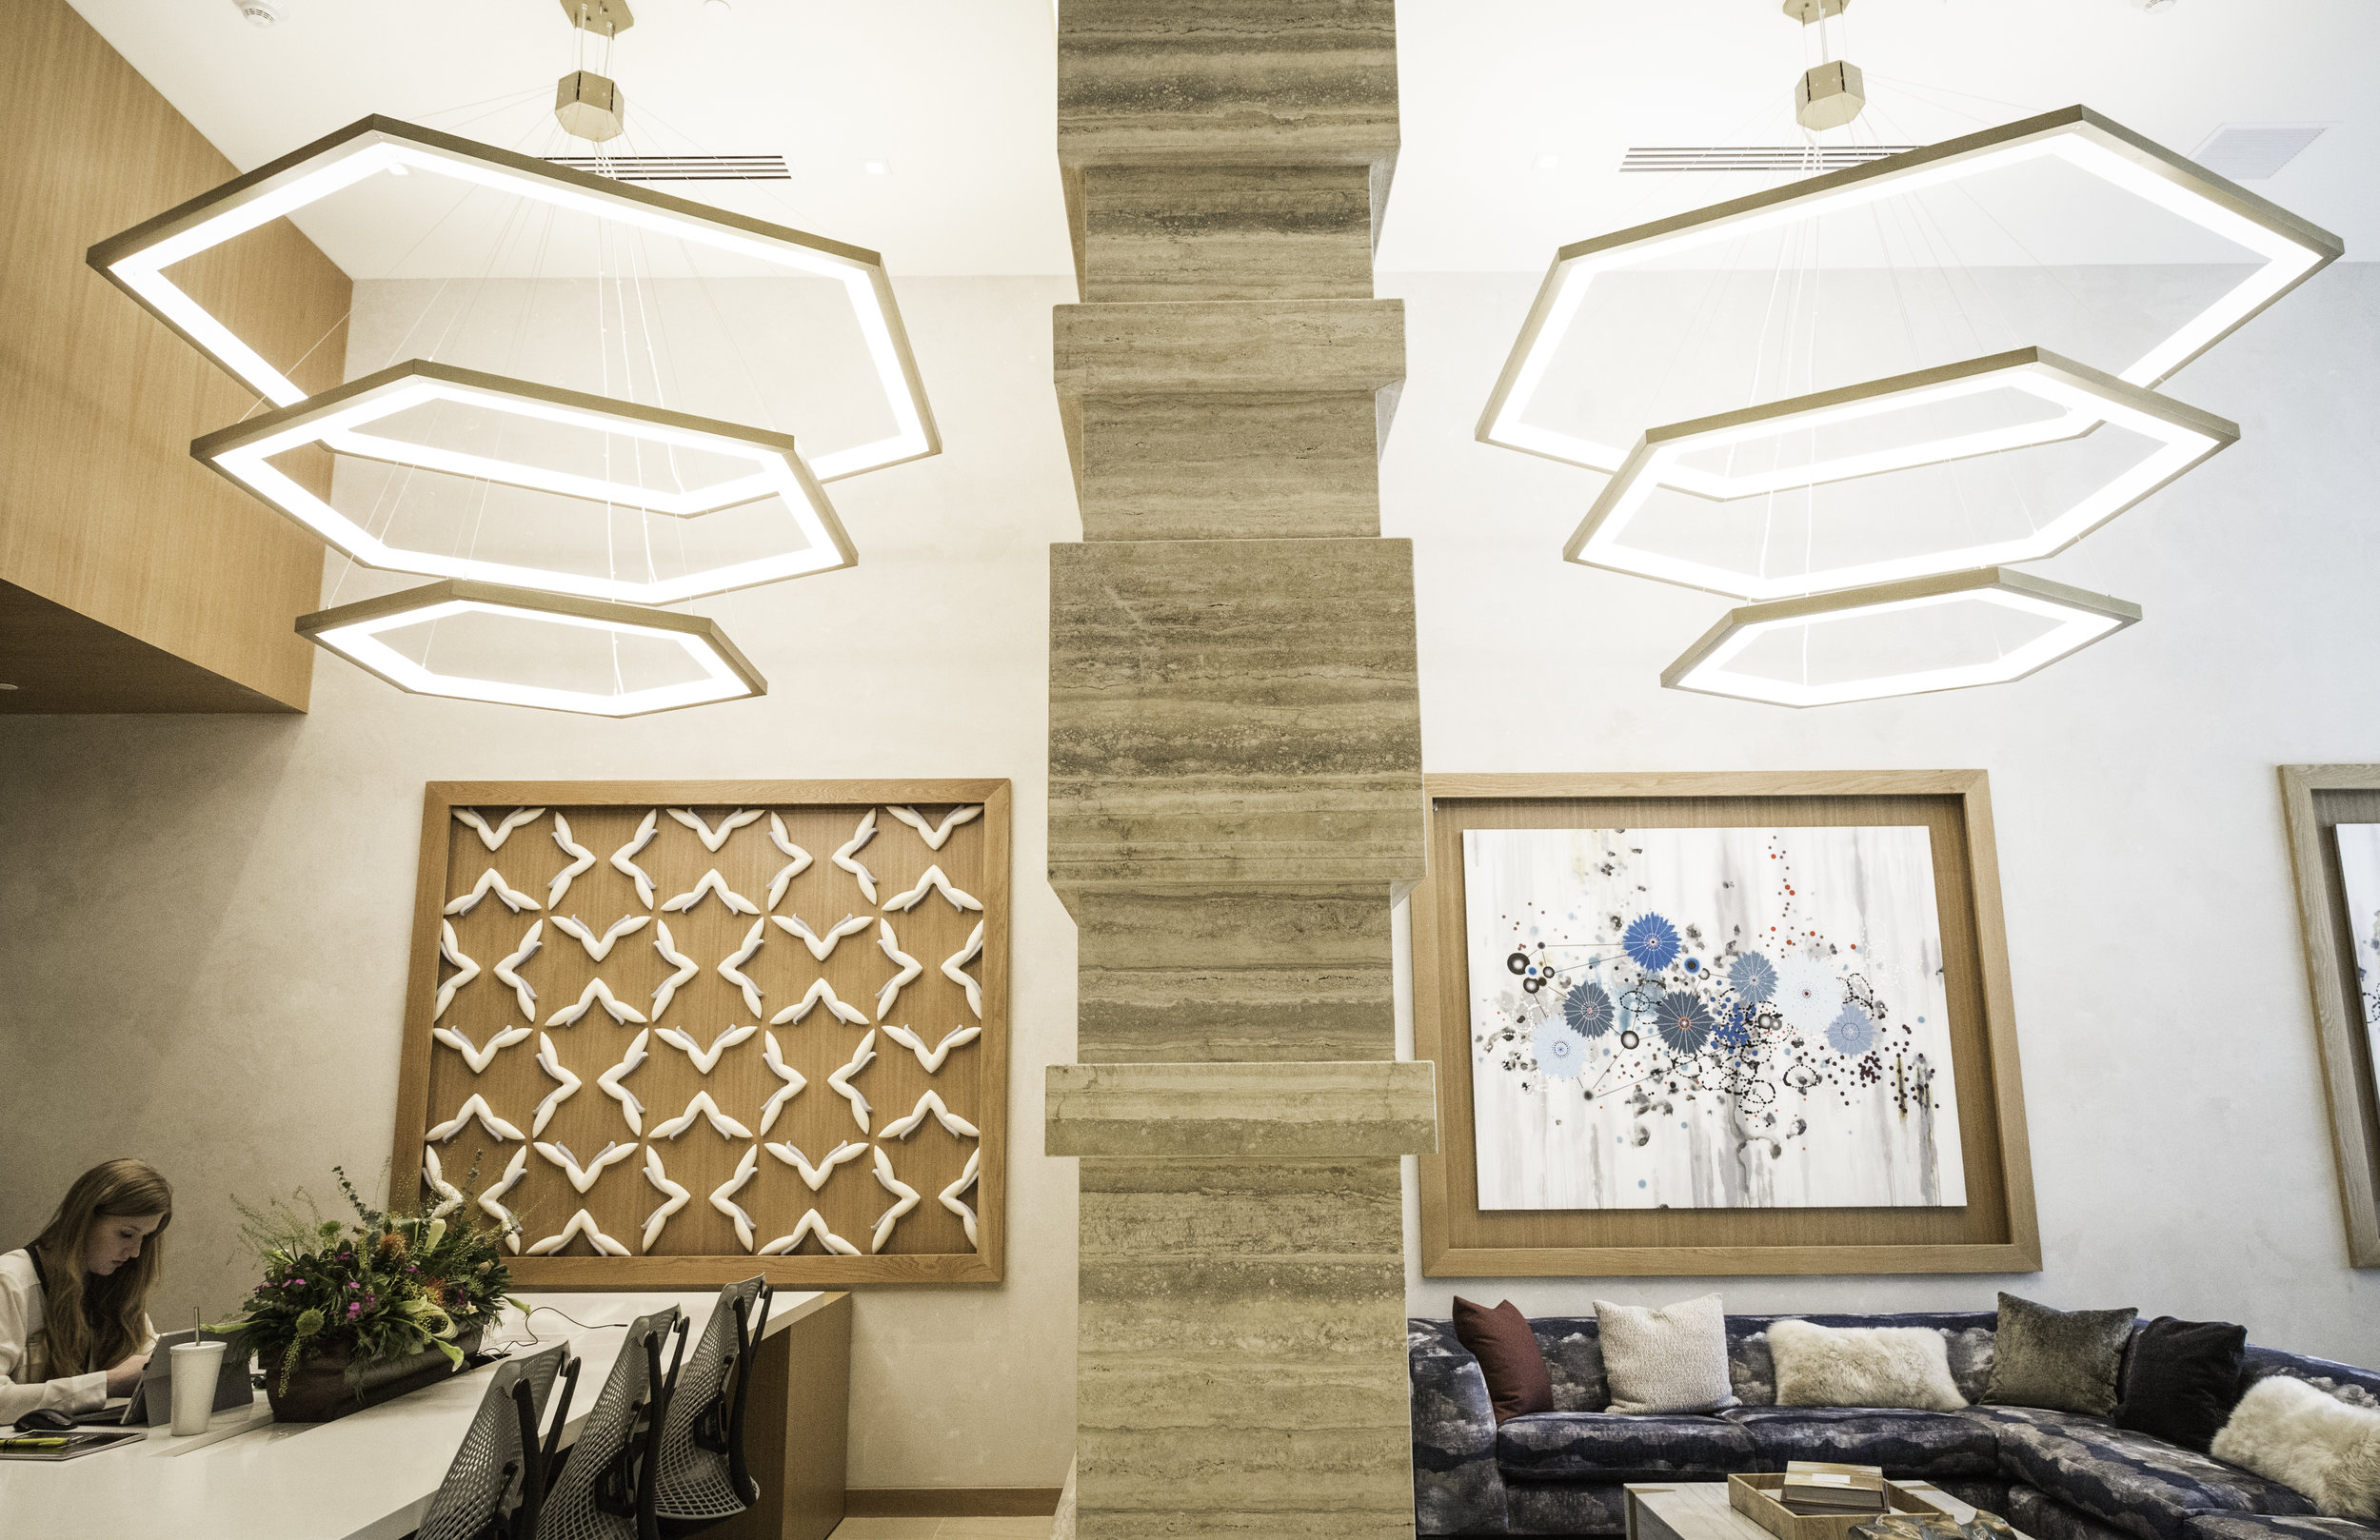 ALW, Design by Neidhardt, Polygon Beyond   Union Denver at Denver Station